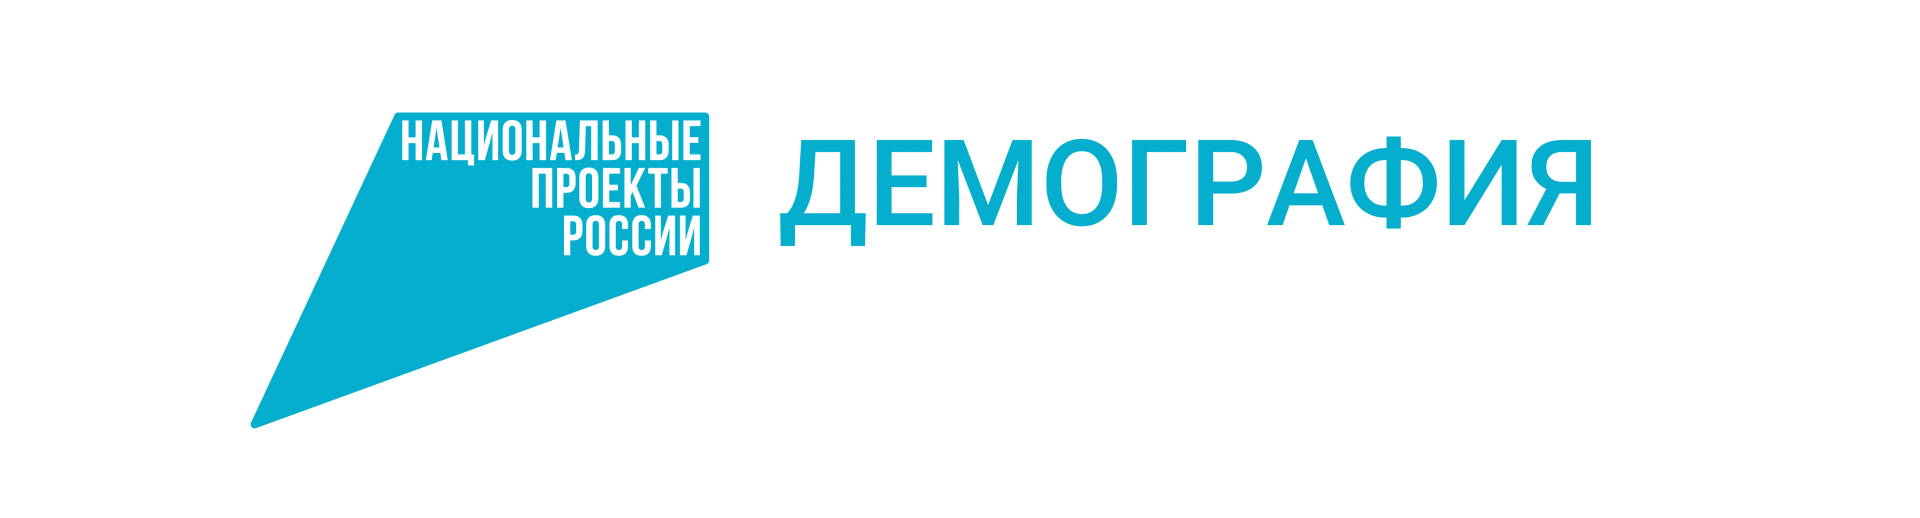 Demografiya_logo_zvet_goriz_lev.png